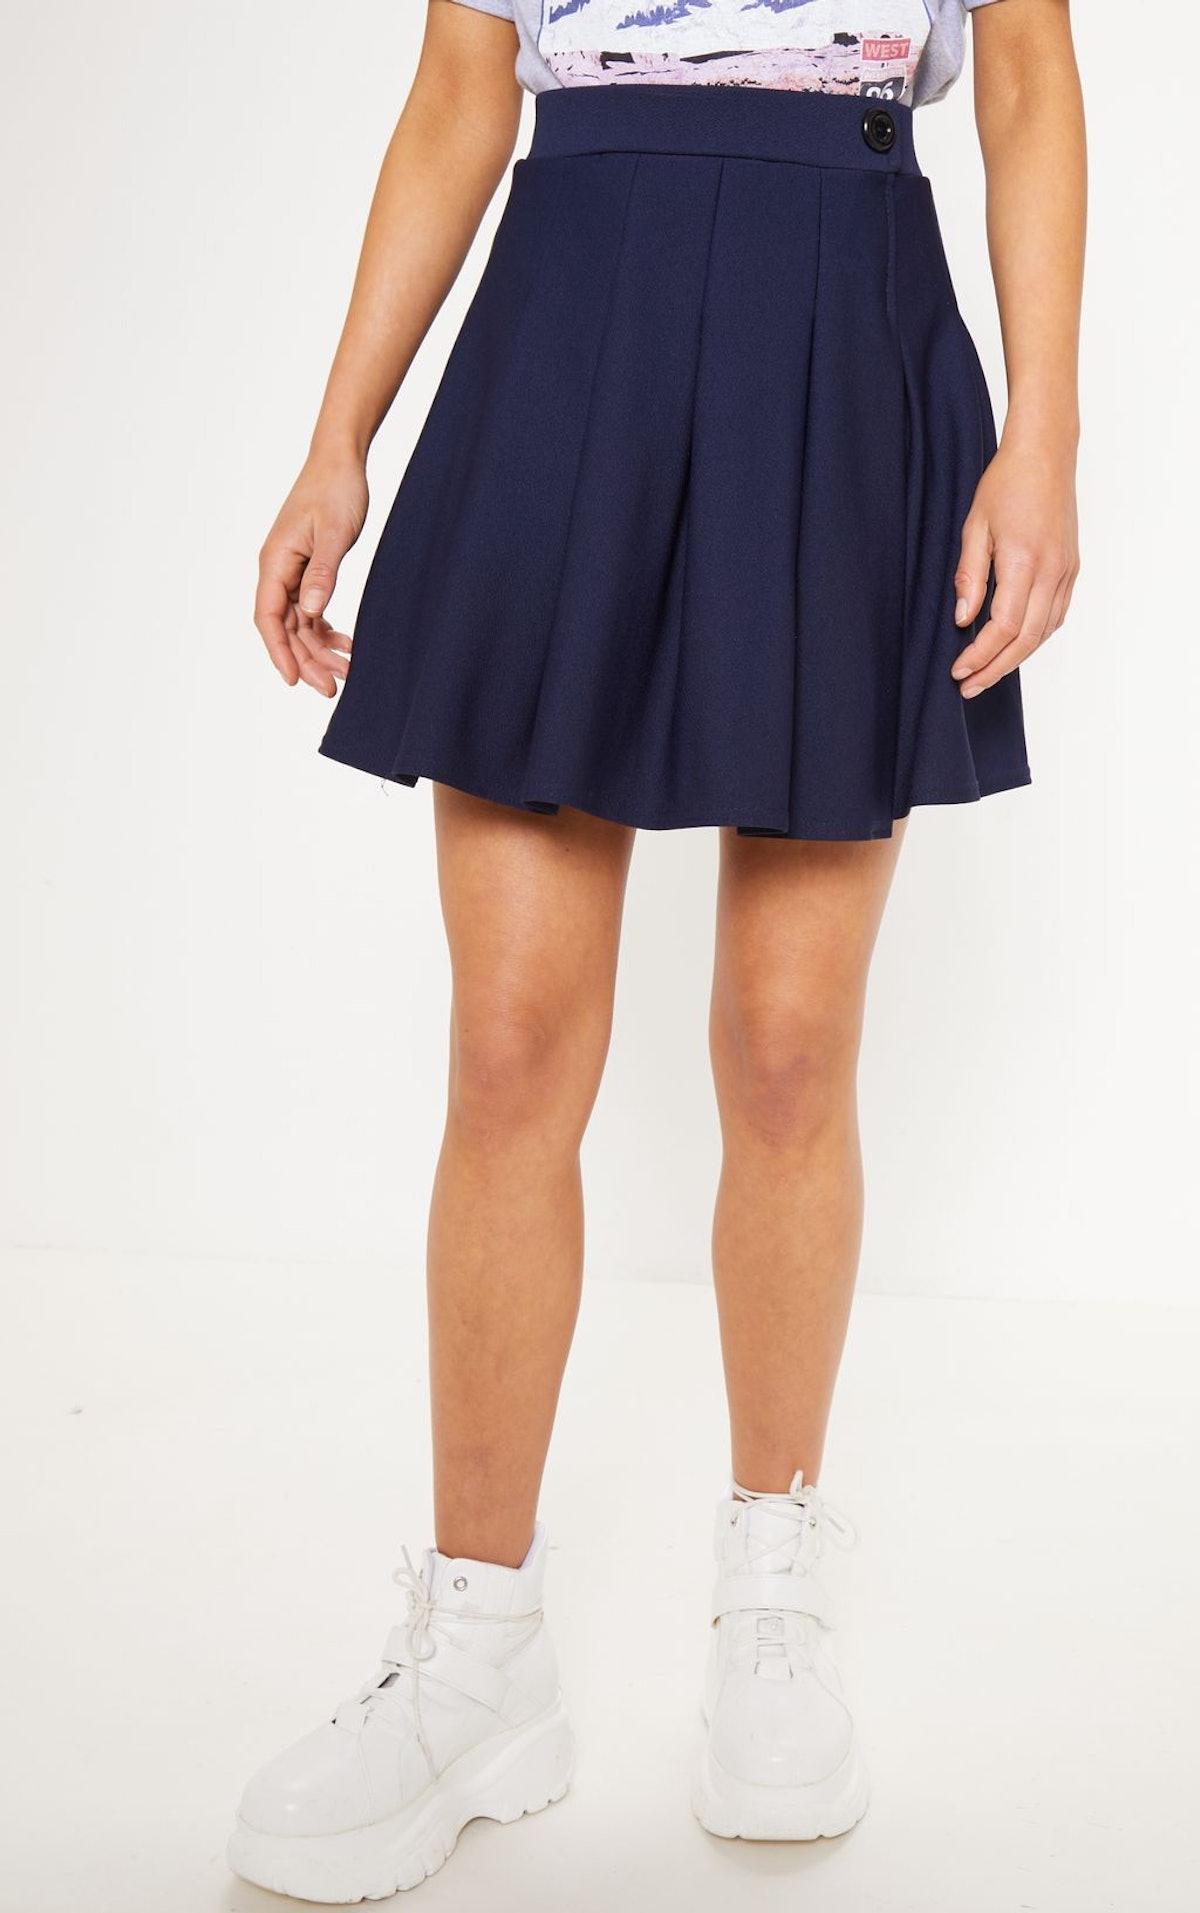 Navy Pleated Tennis Skirt